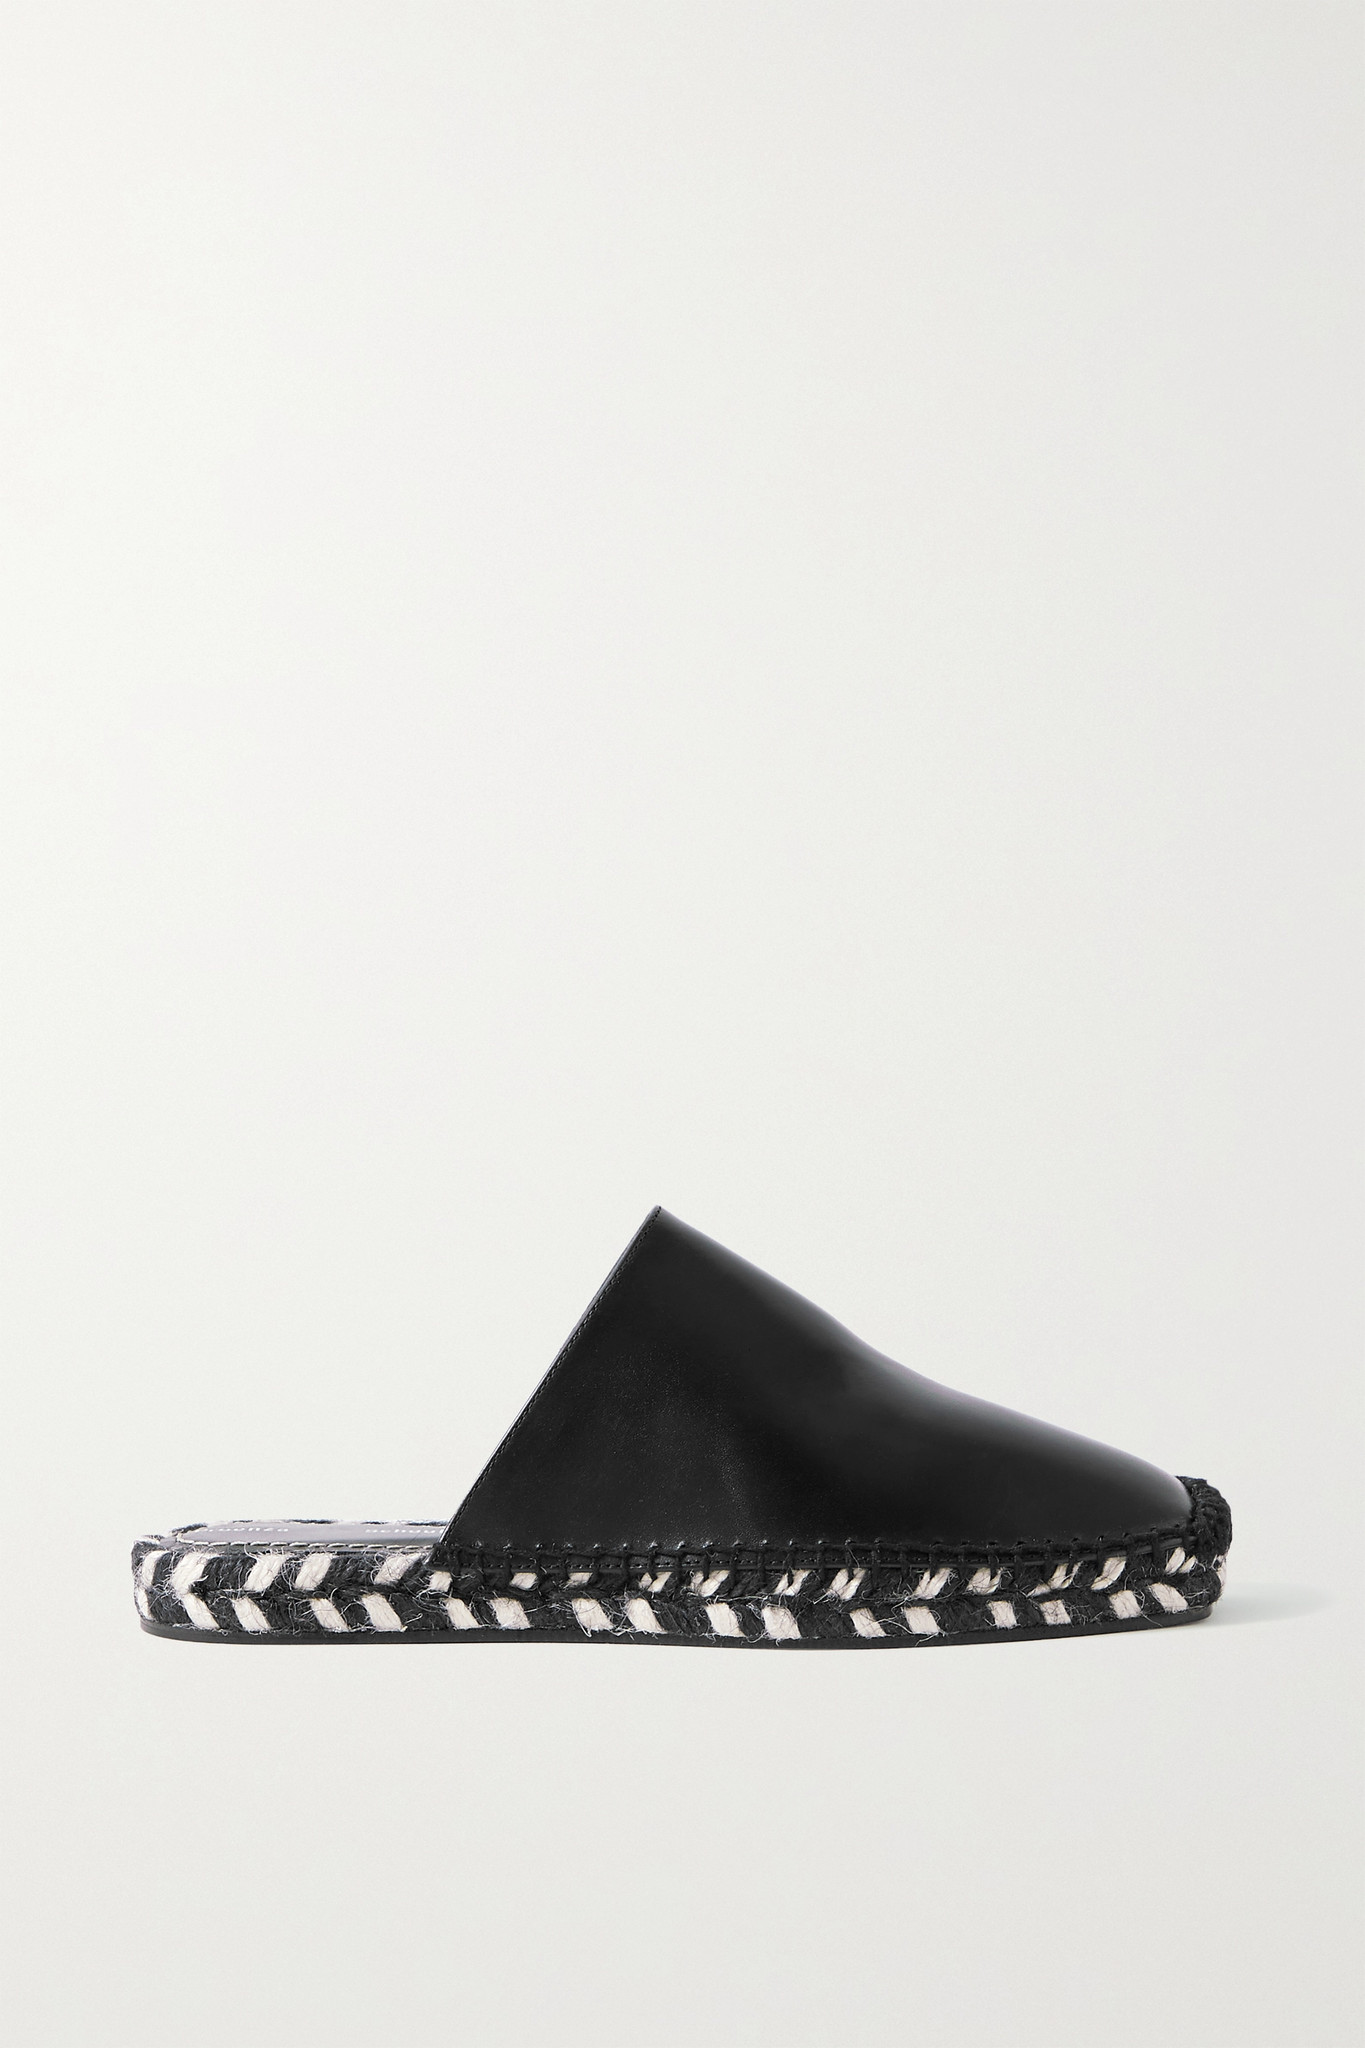 PROENZA SCHOULER - 皮革麻底鞋 - 黑色 - IT40